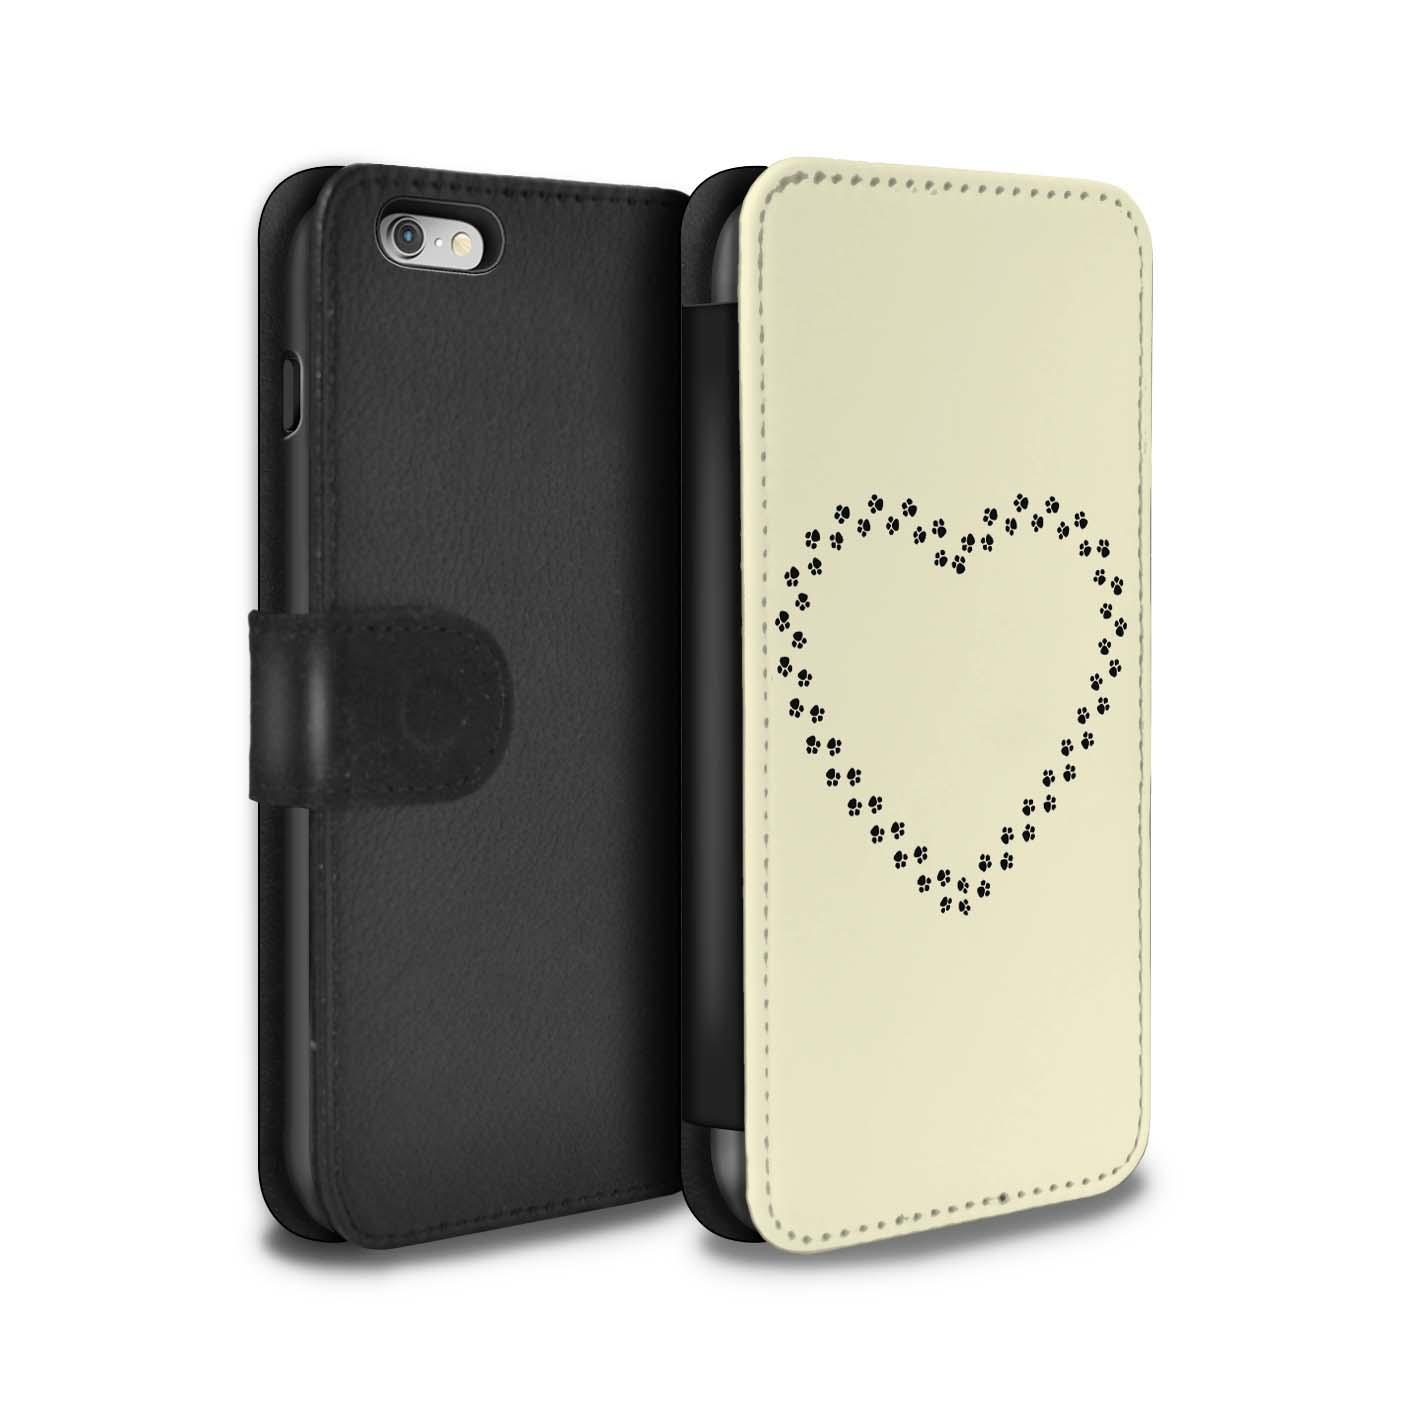 Coque-Etui-Case-Cuir-PU-pour-Apple-iPhone-6S-Plus-Chat-Mignon-Dessin-Anime